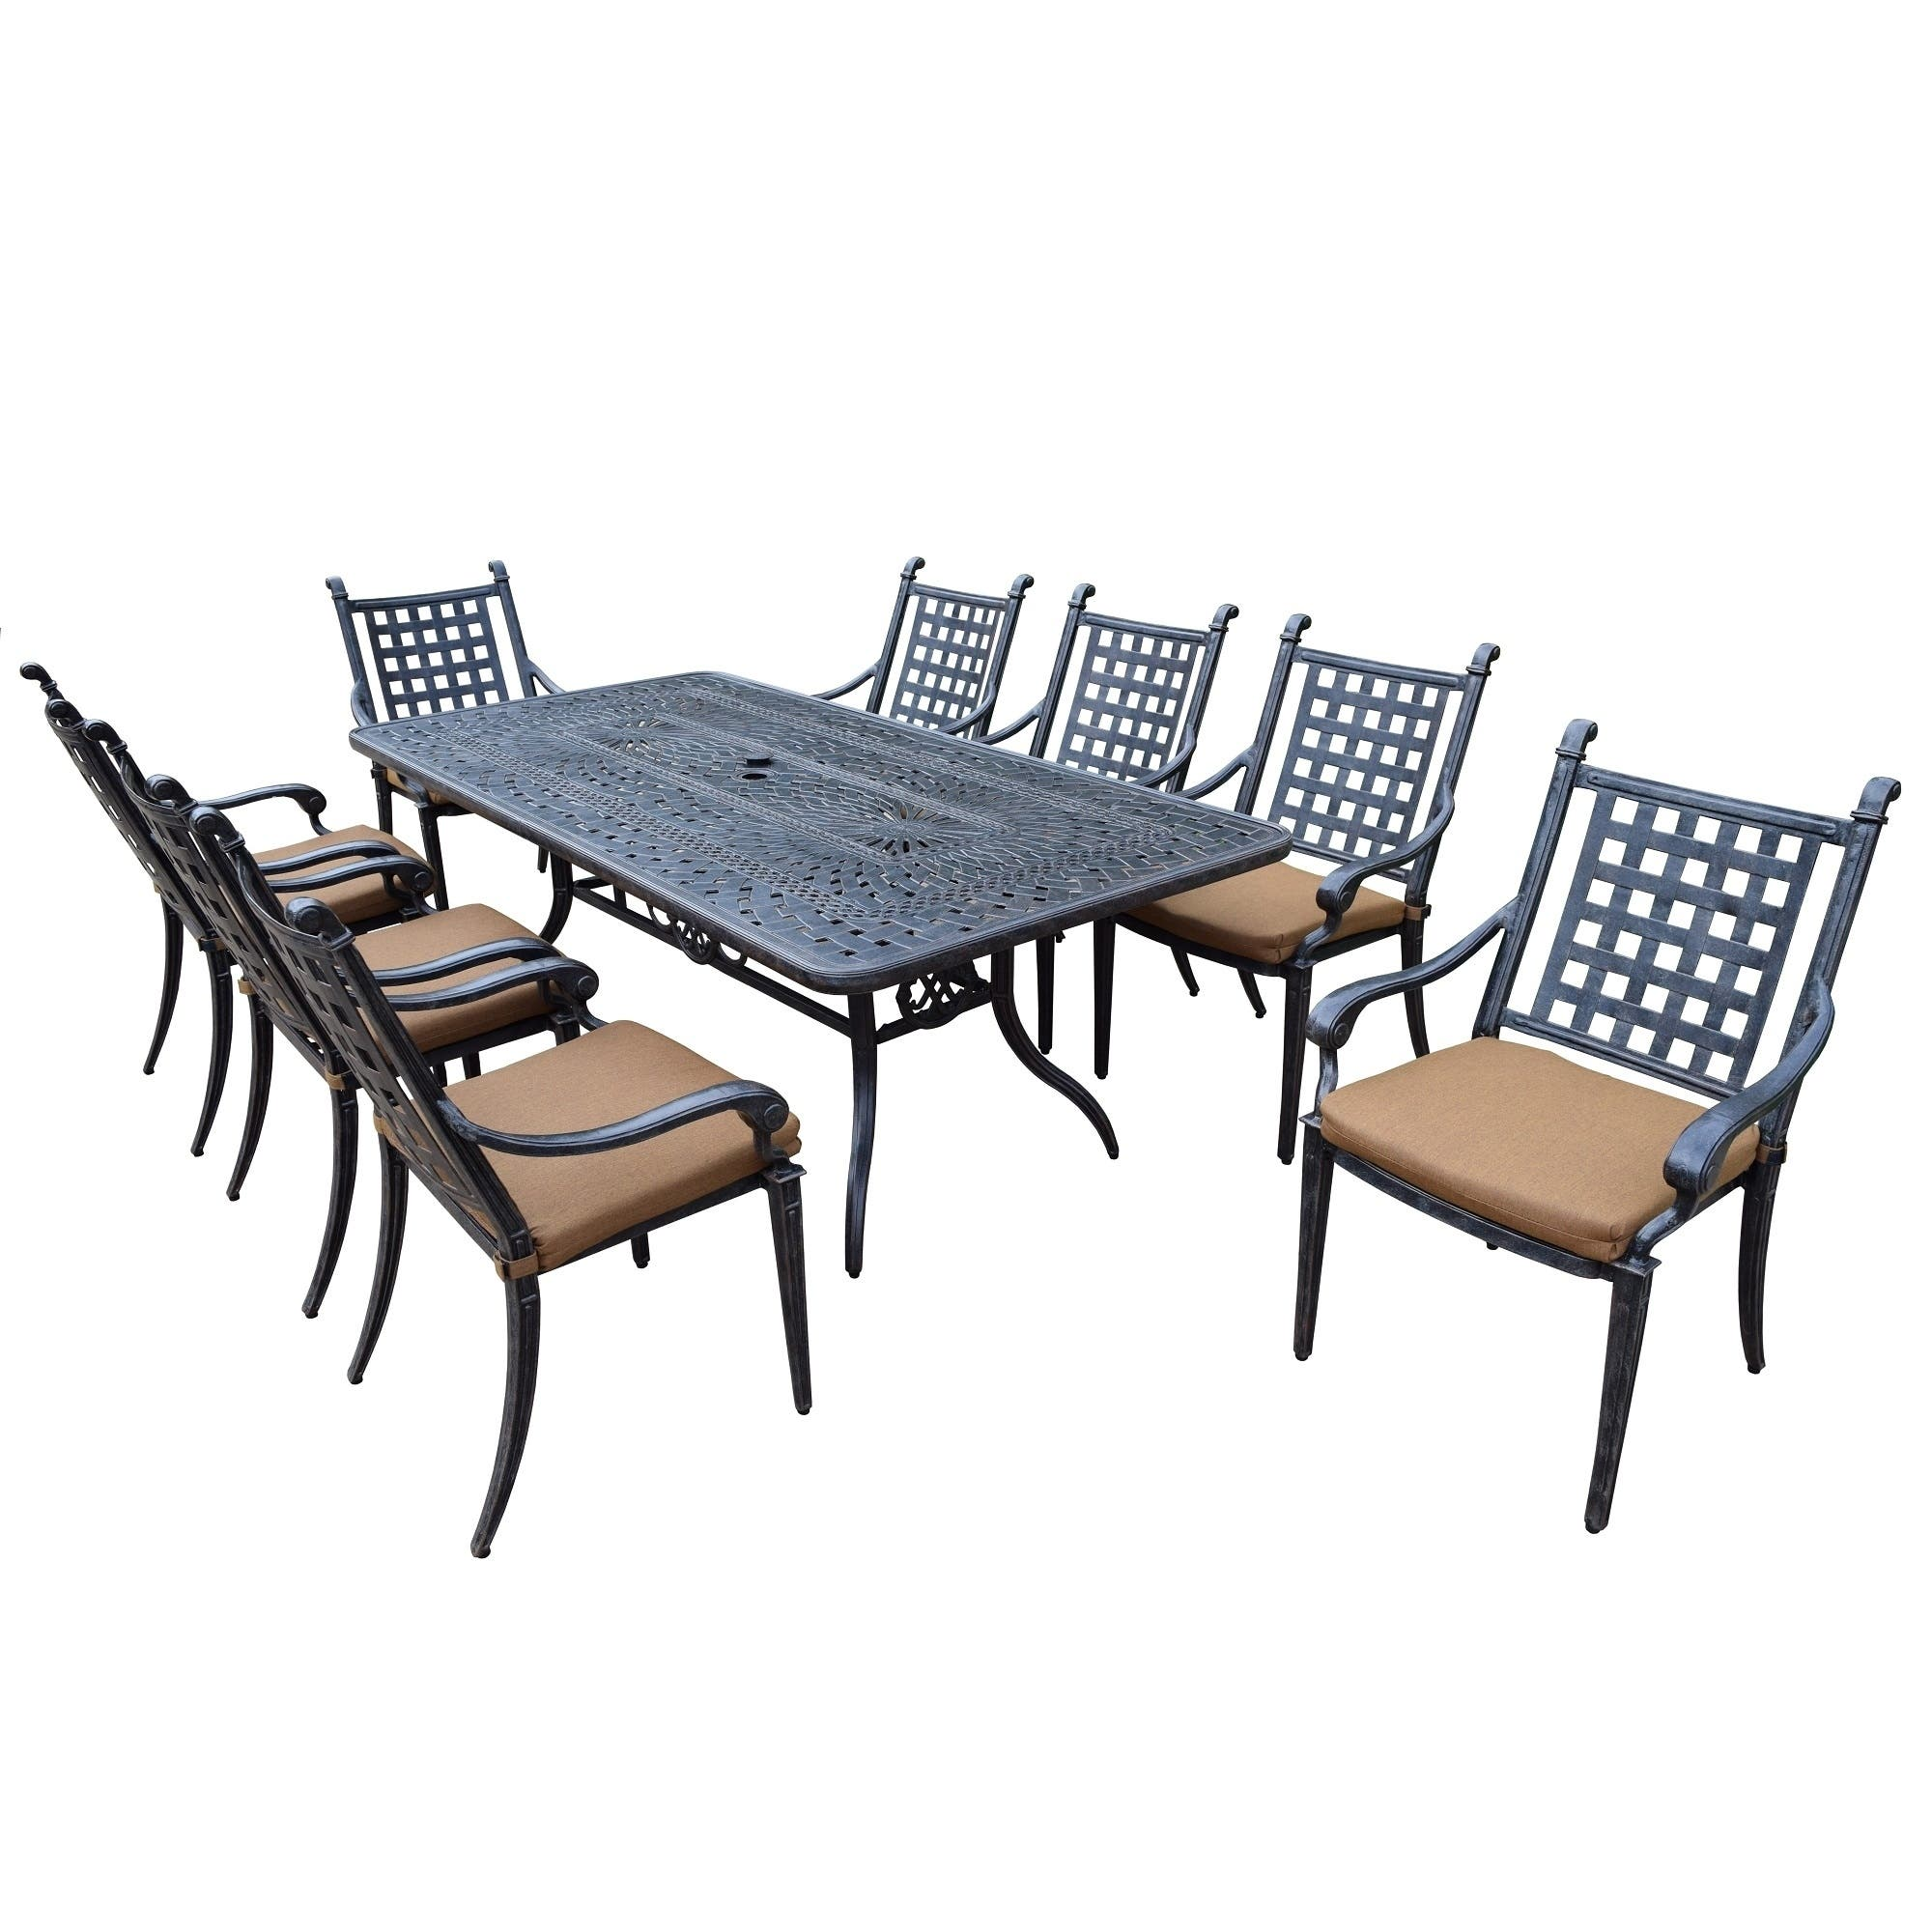 Best Furniture Deals Online: Buy Outdoor Dining Sets Online At Overstock